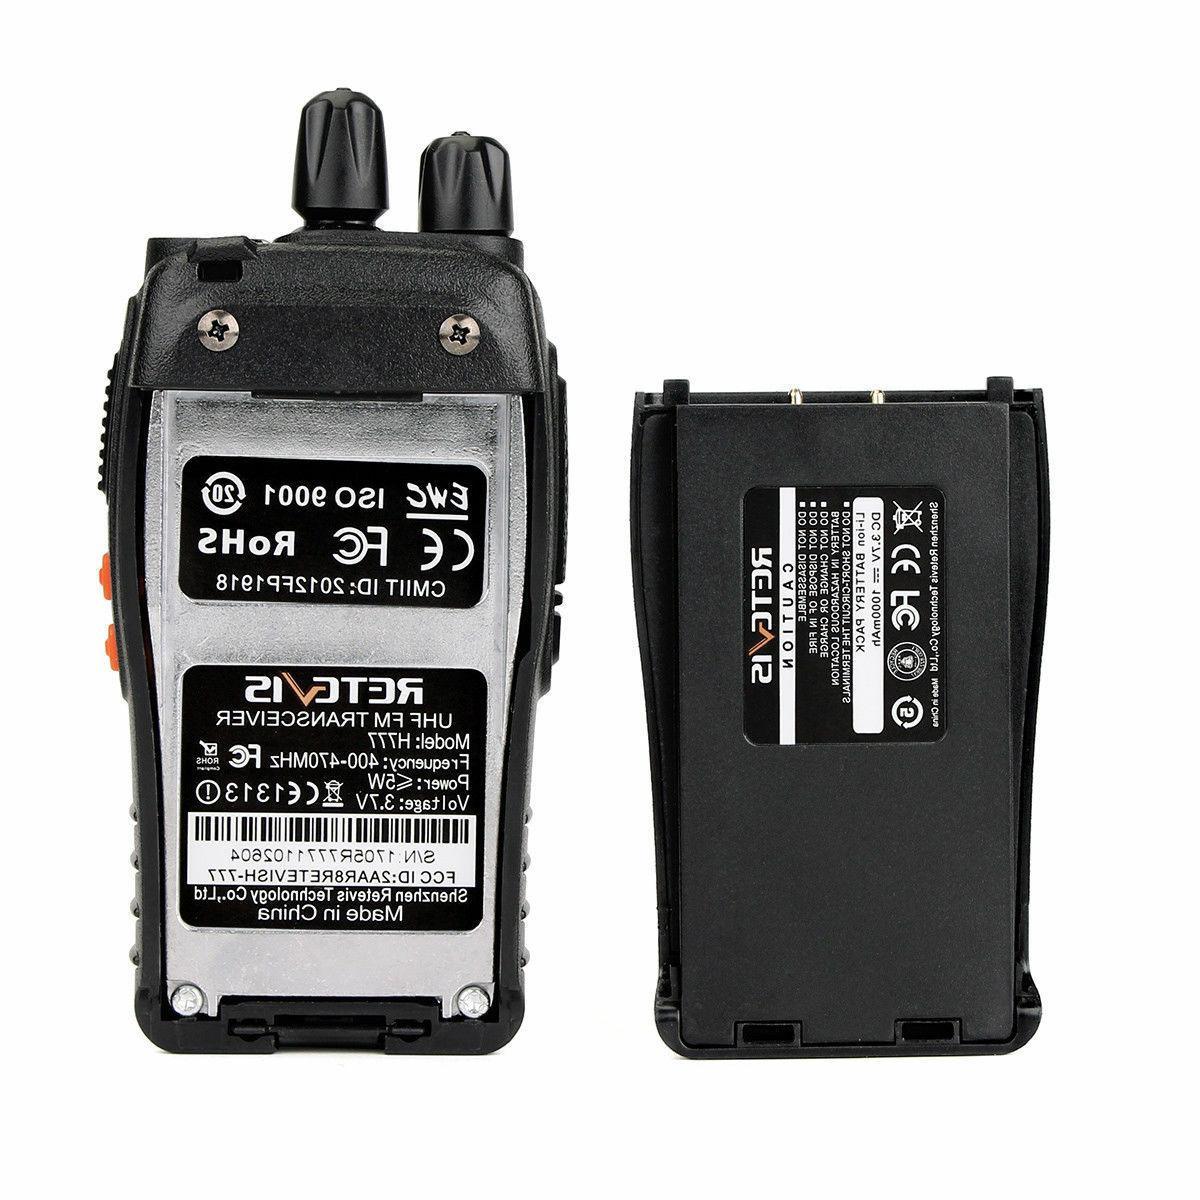 Walkie UHF 16CH VOX 2-Way Radio+Earpiece+PTT